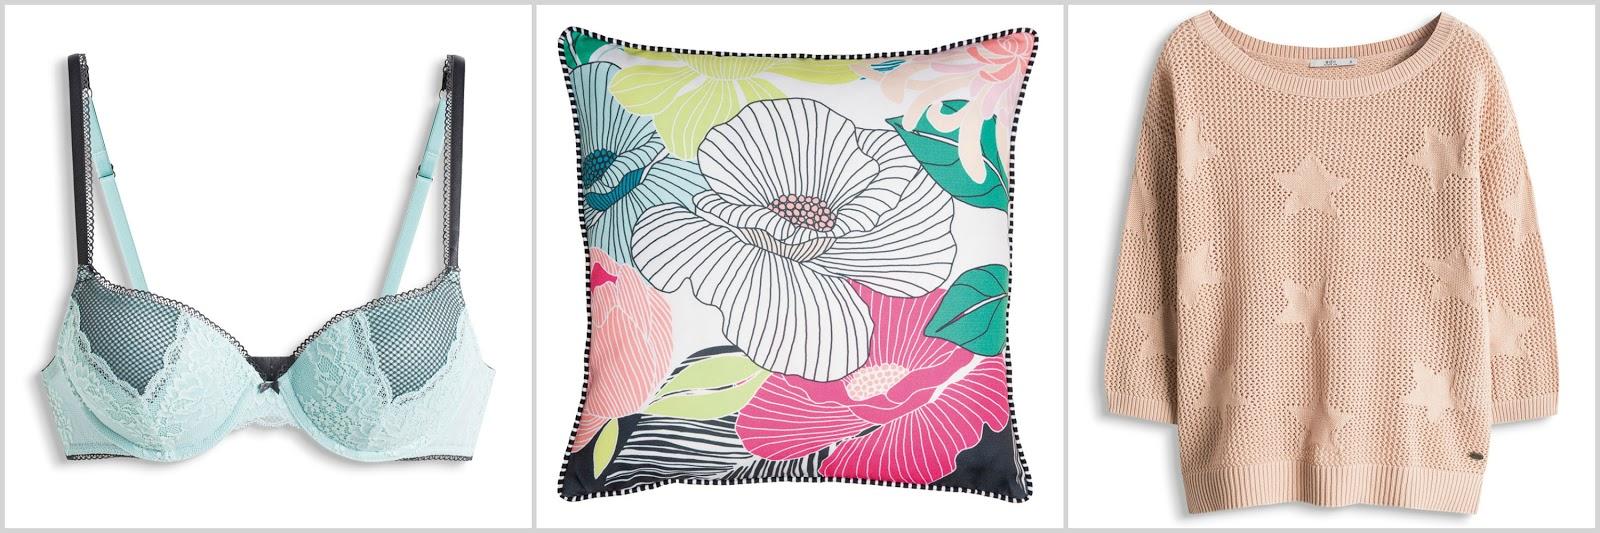 spring esprit wishlist pastel lingerie floral print cushion dusky pink star sweater